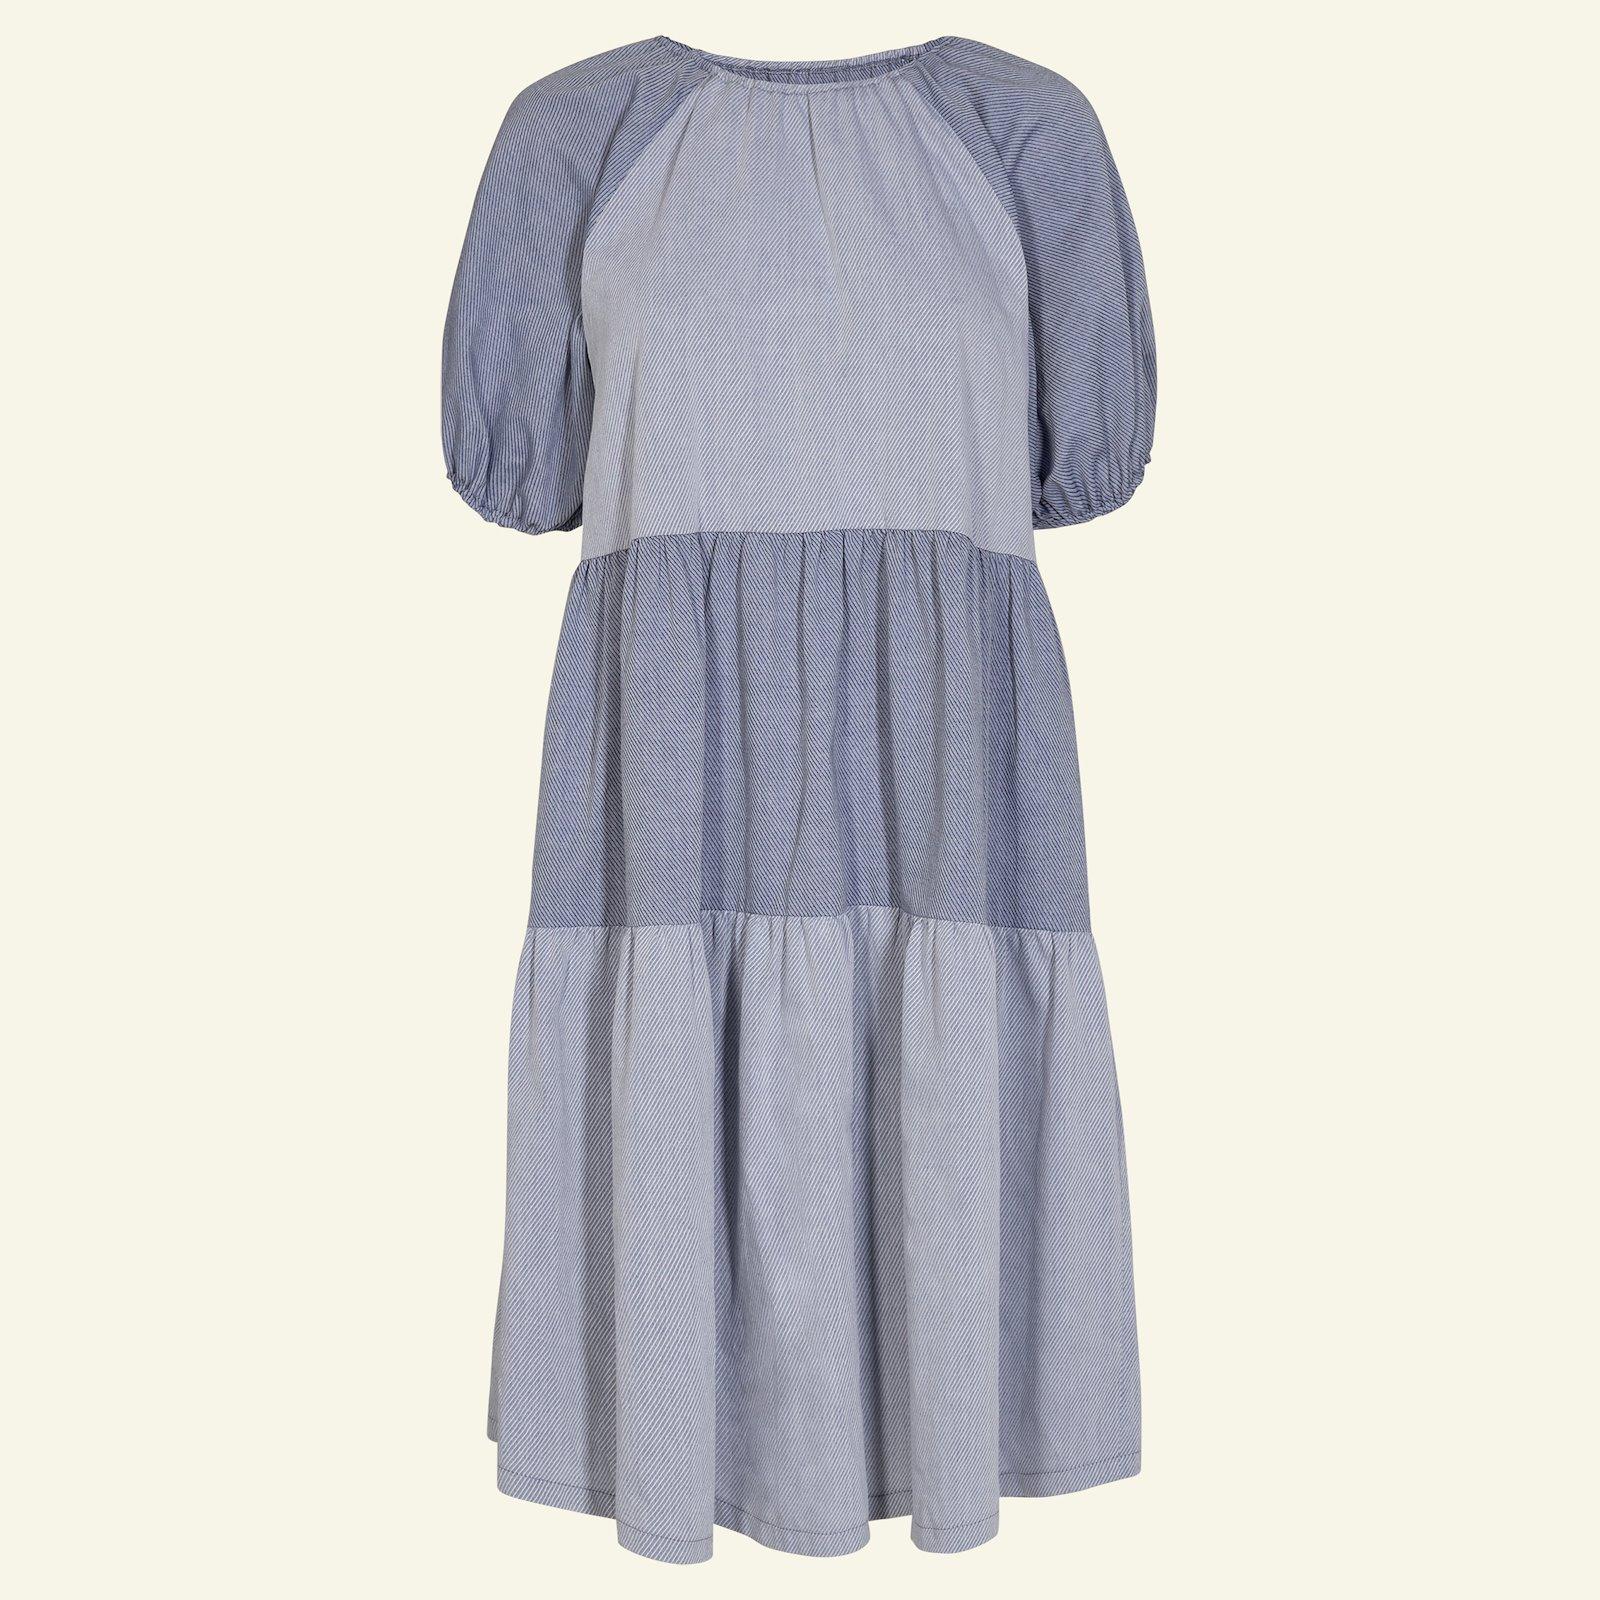 Babydoll dress, 36/8 p23168_501860_sskit